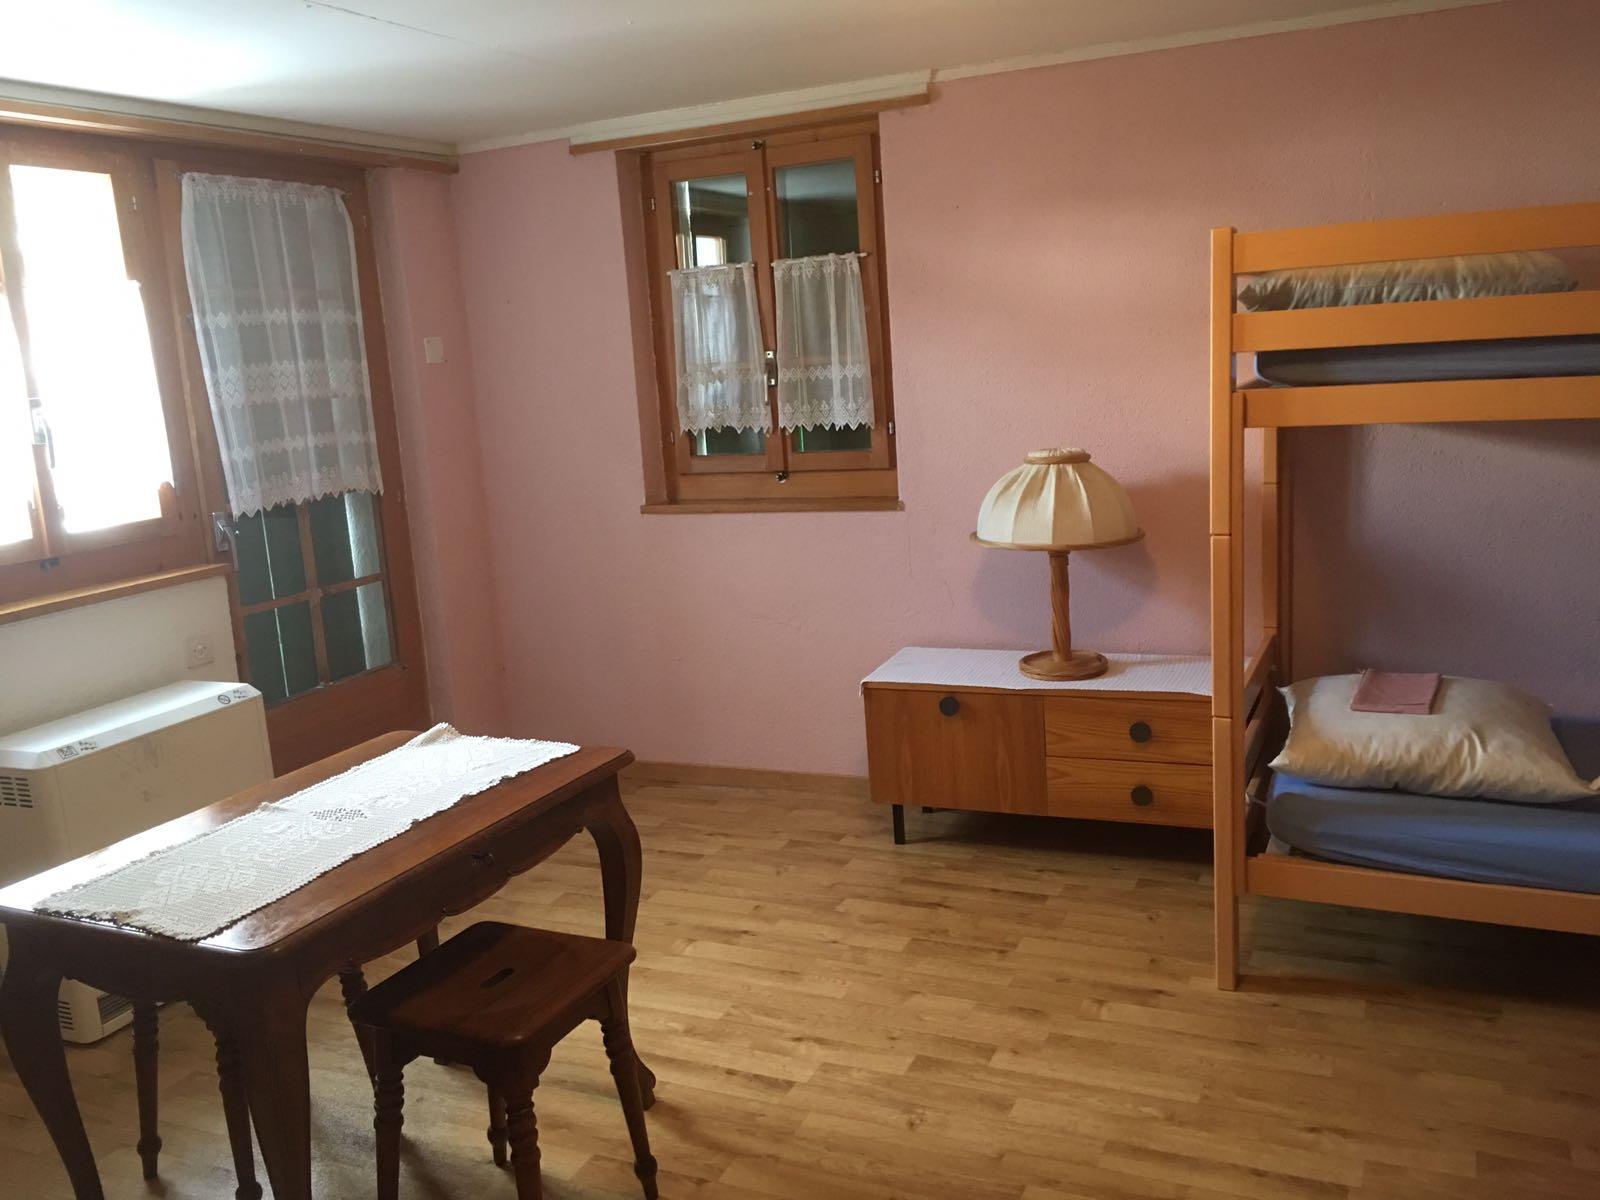 1 Zimmer mit 2 Kajütenbetten